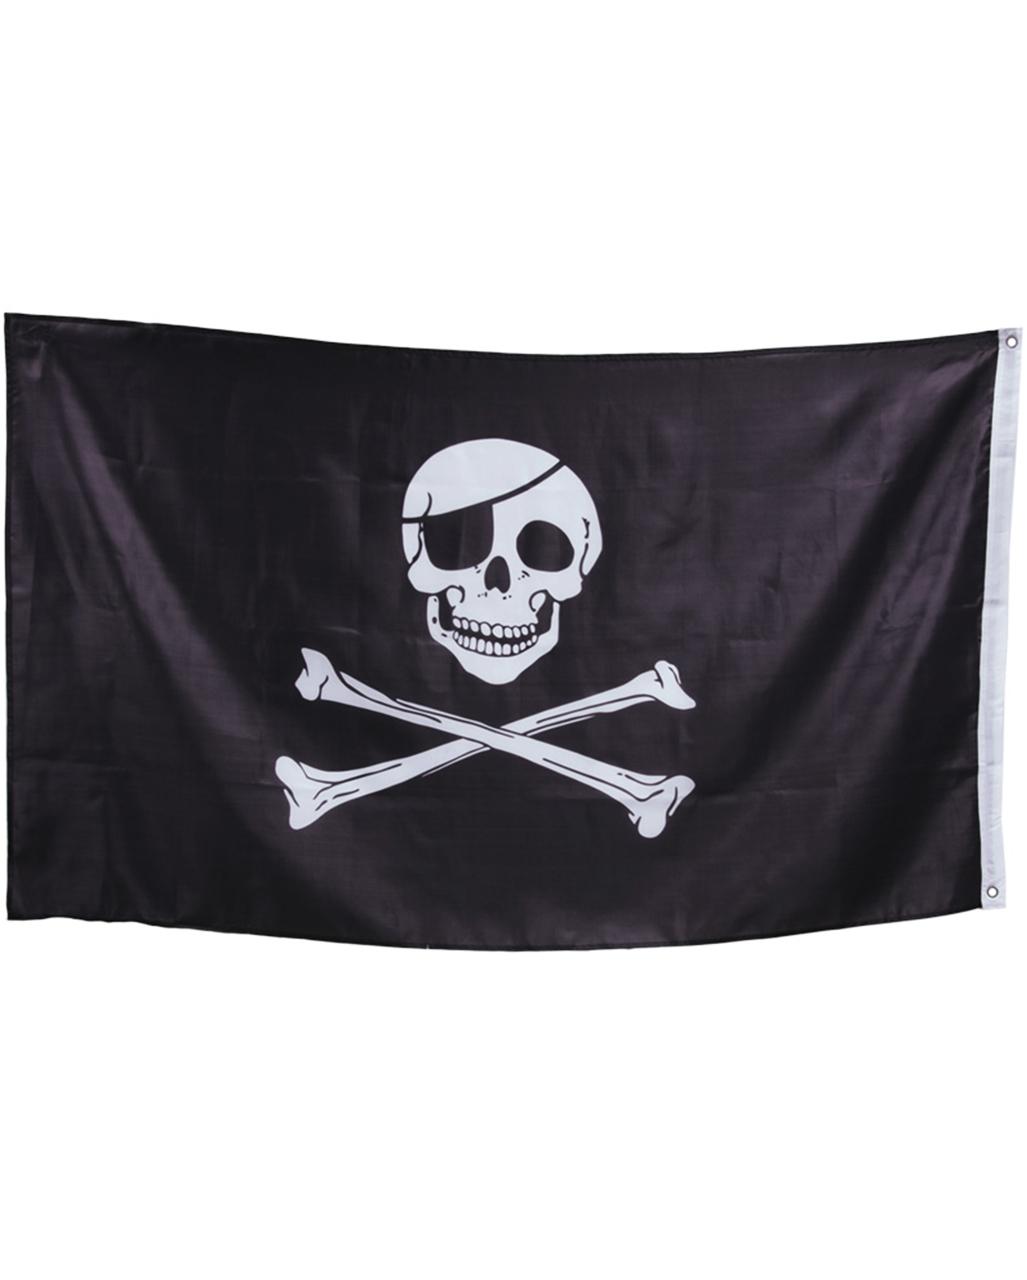 Piratendeko Partydekoration Pirat Fahne Totenkopf Flagge 90 x 150 cm Seeräuber